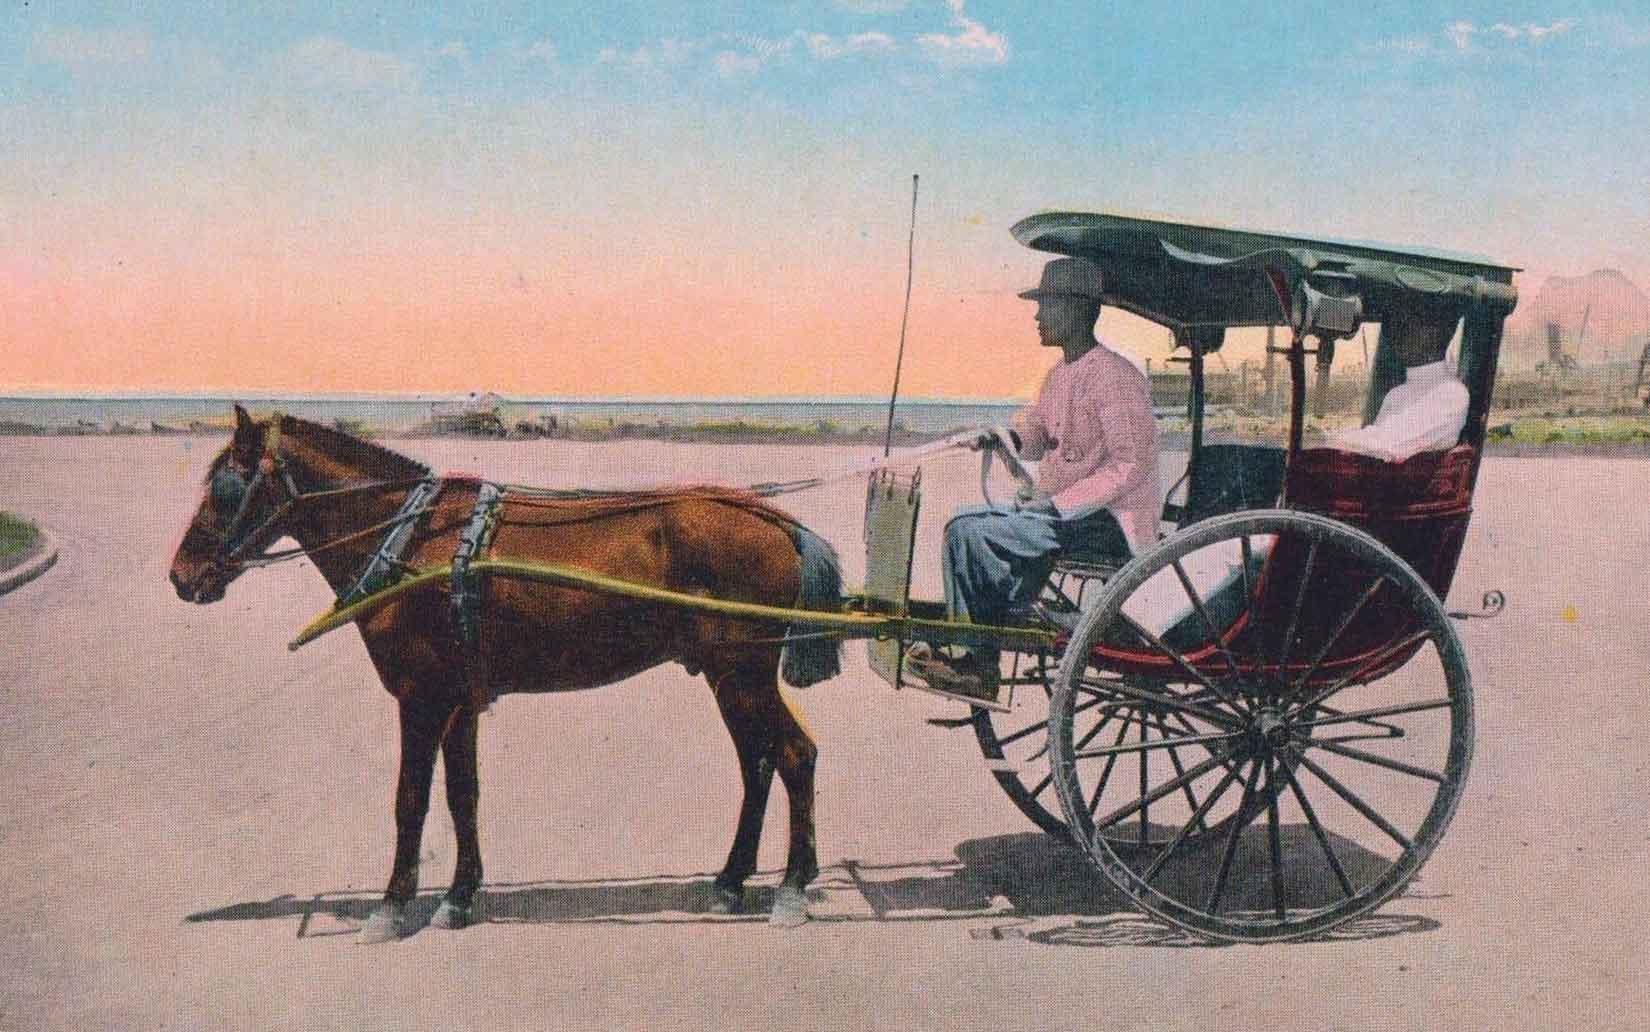 vintage-postcard-kalesa-calesa